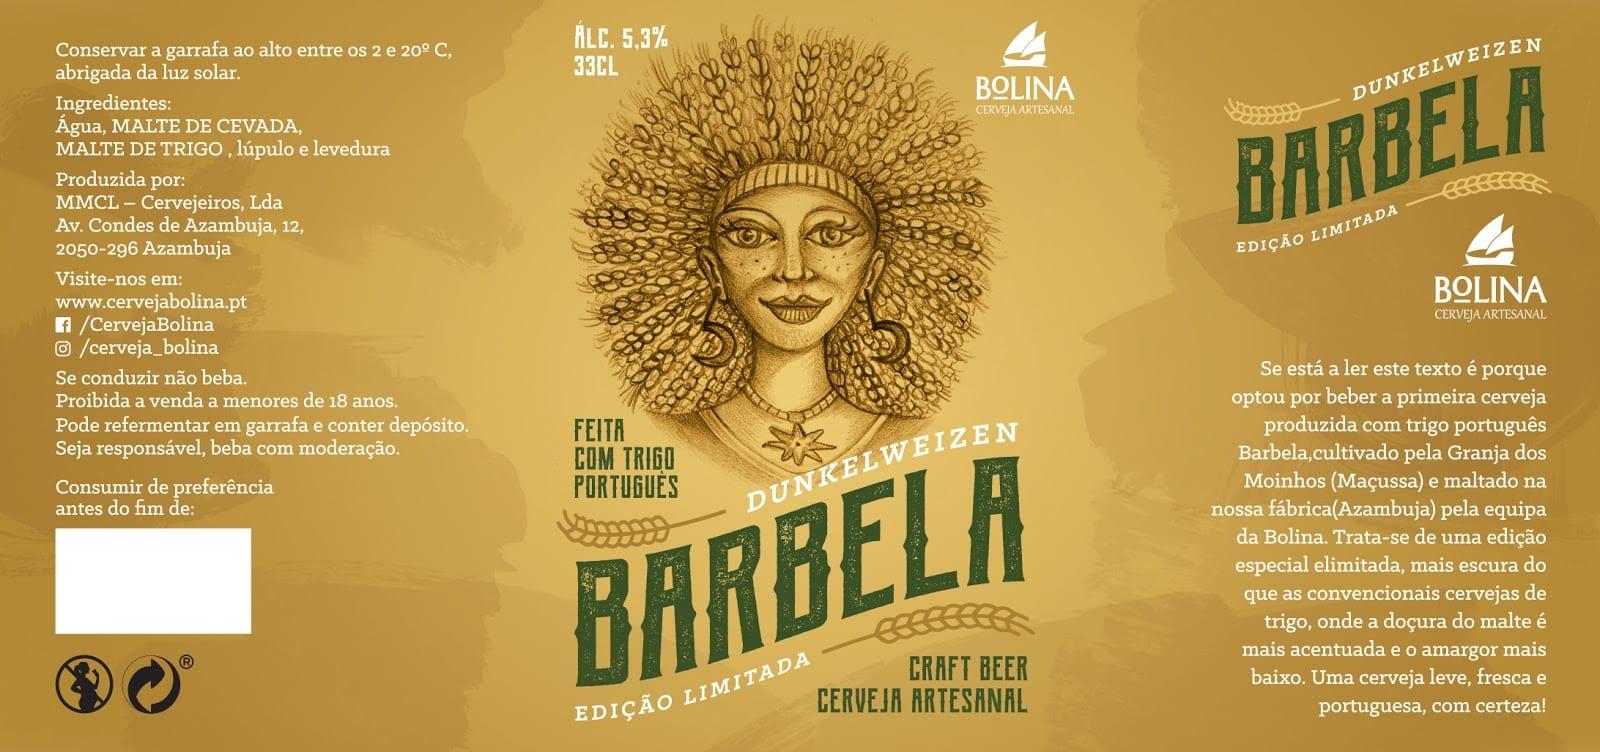 Barbela 02 - Ach, tie obaly – Barbela